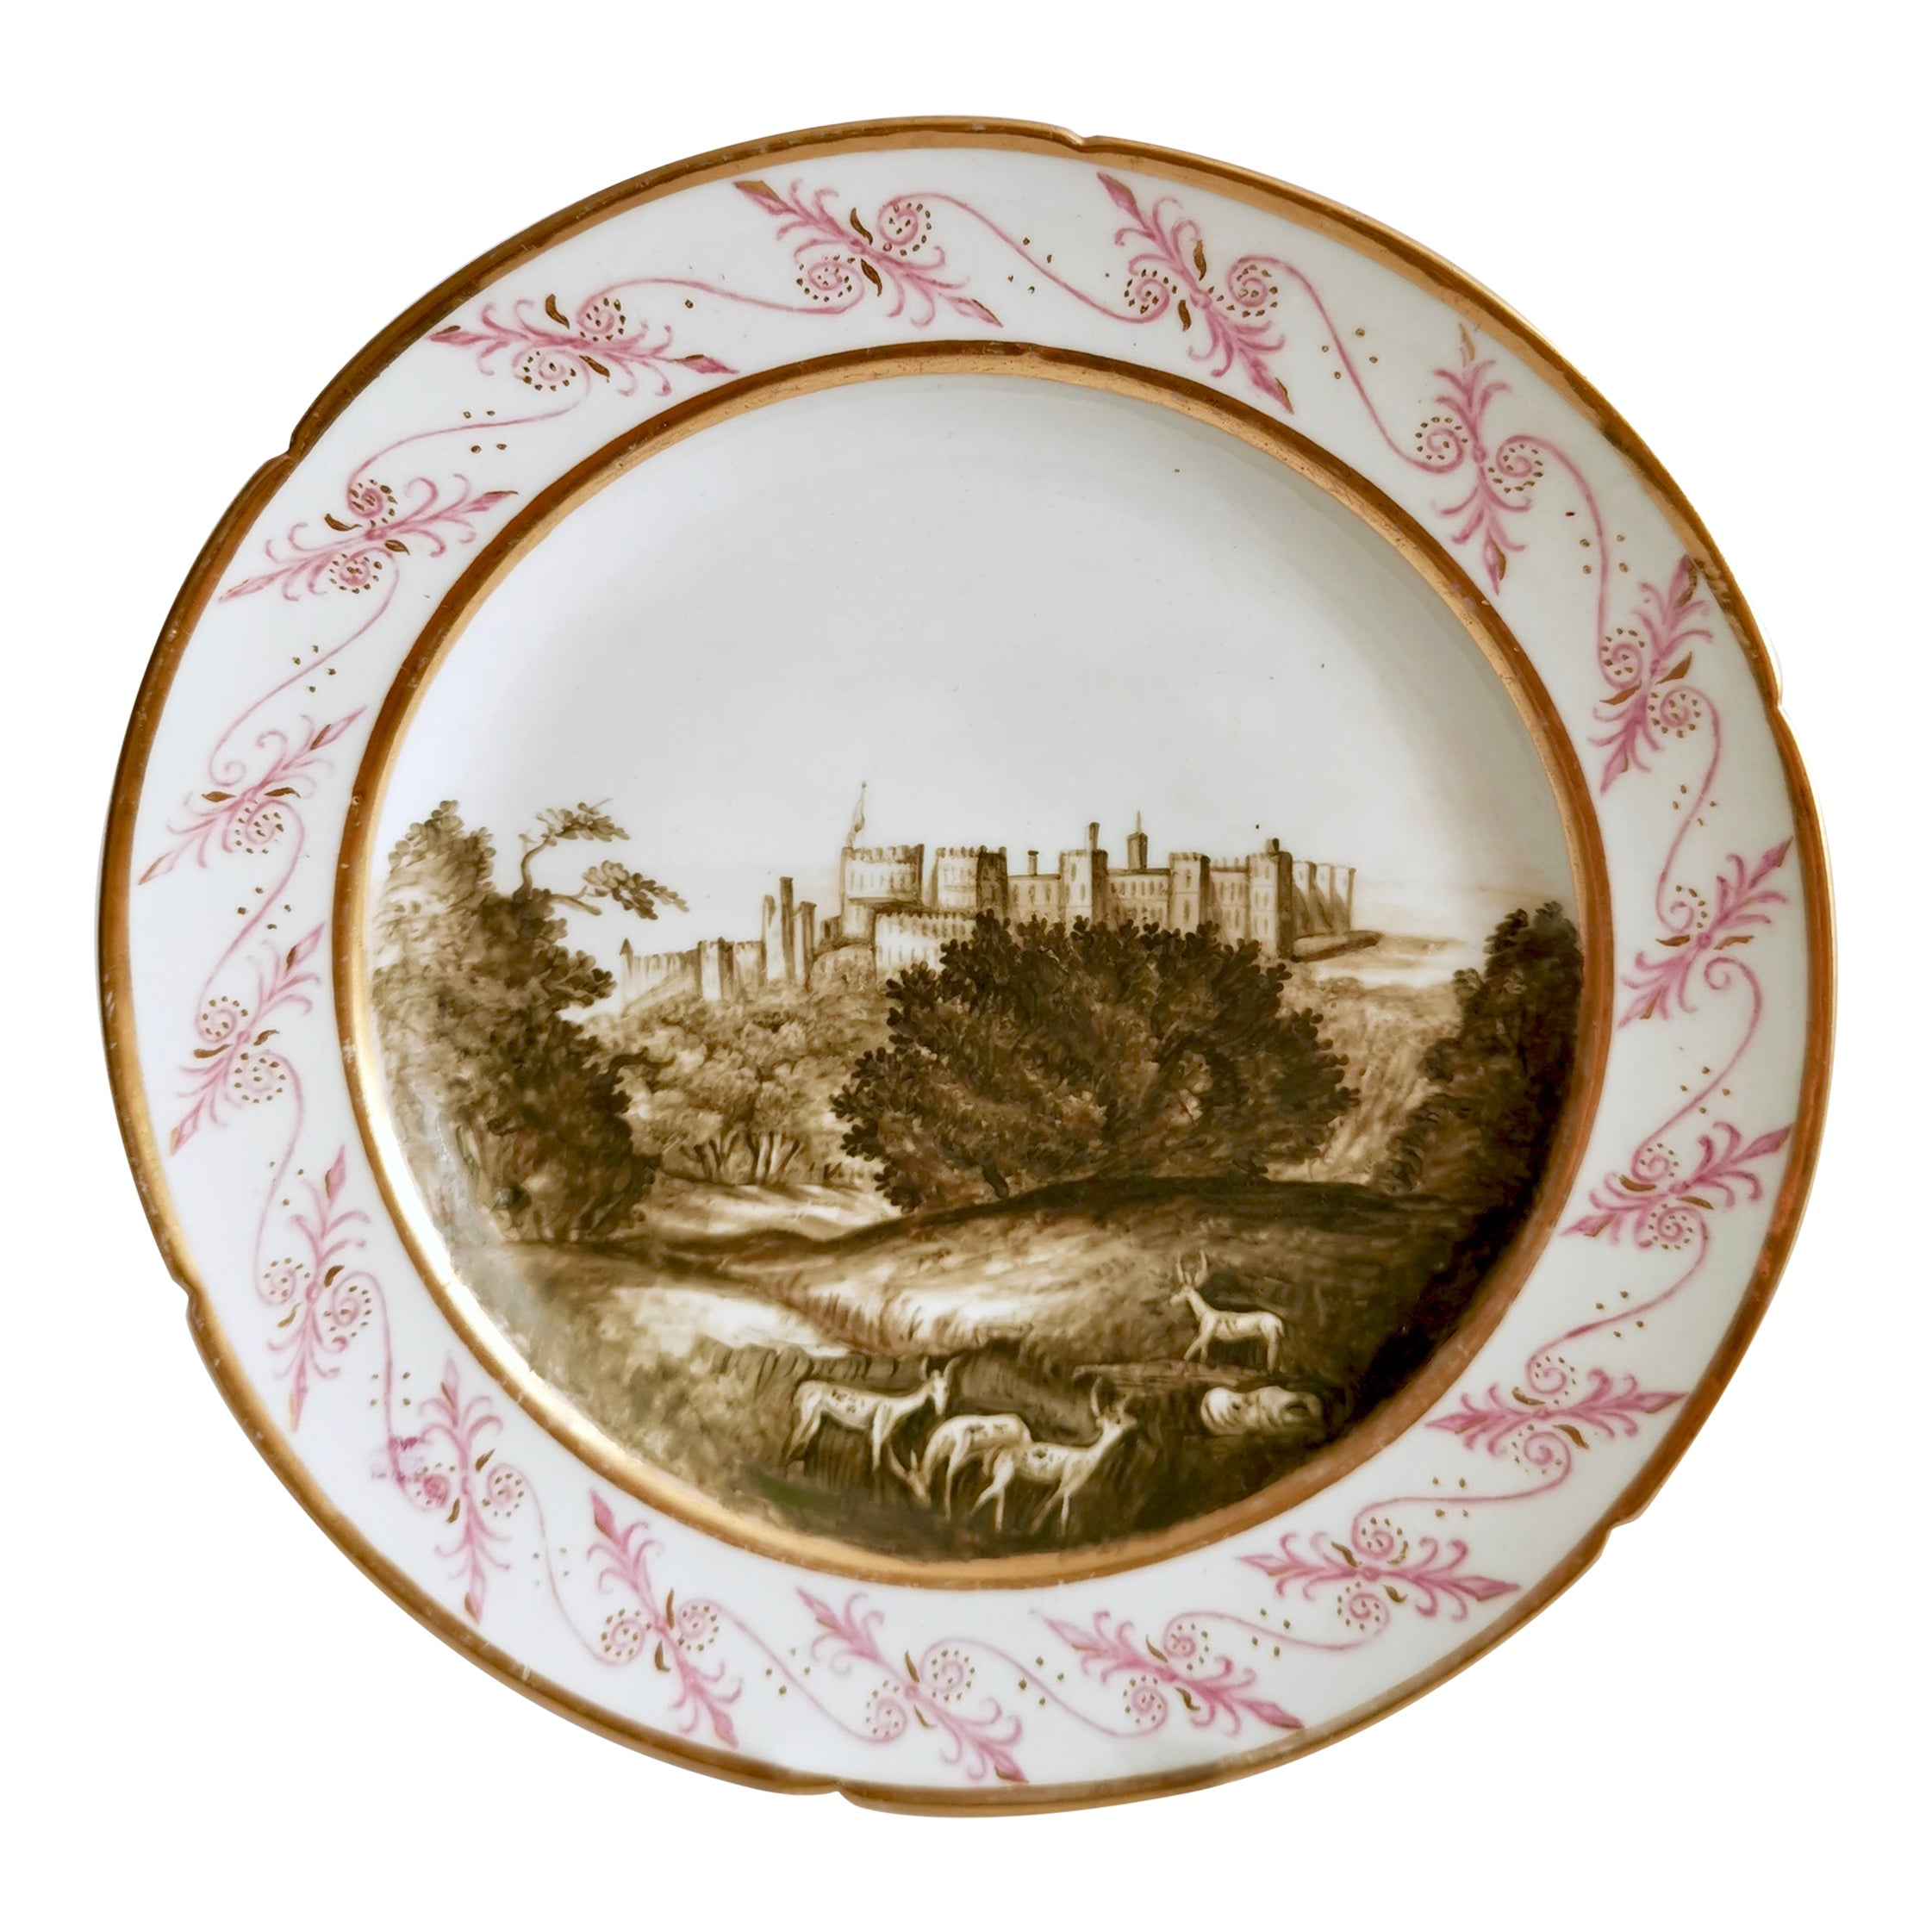 Coalport Porcelain Plate, Landscape in Sepia, by Thomas Baxter, Georgian ca 1805